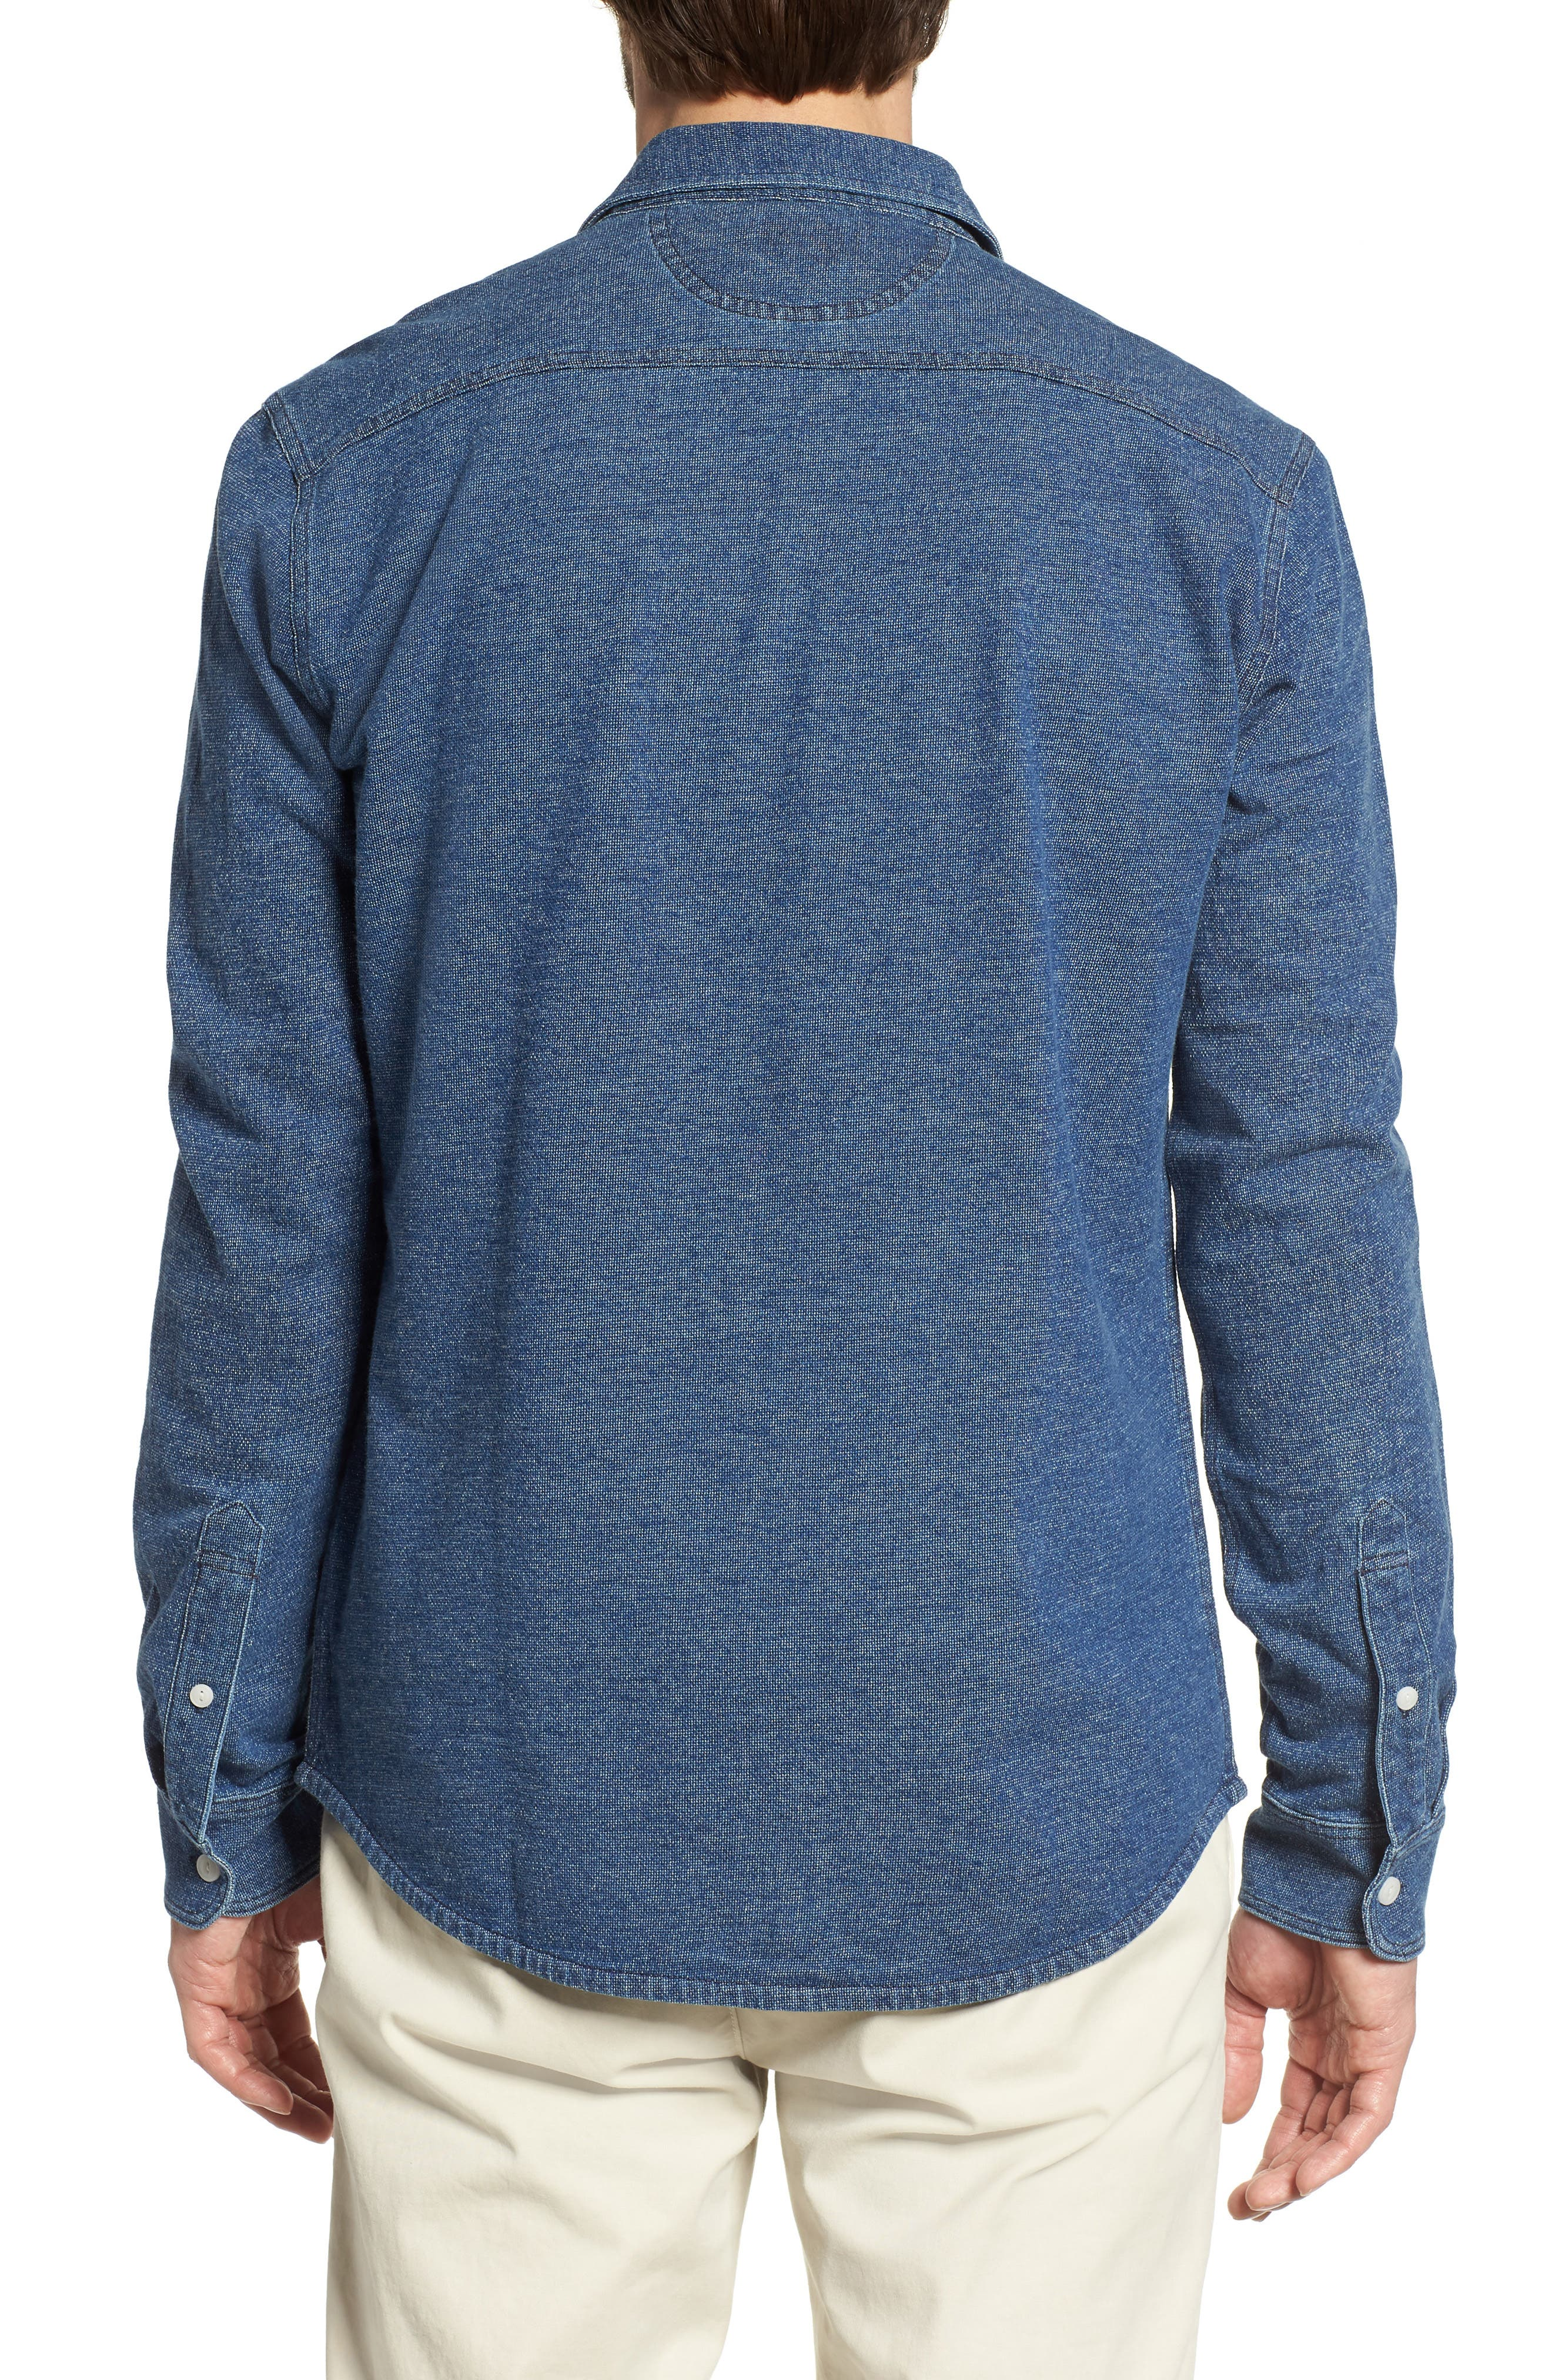 Belmar Chambray Knit Sport Shirt,                             Alternate thumbnail 2, color,                             420